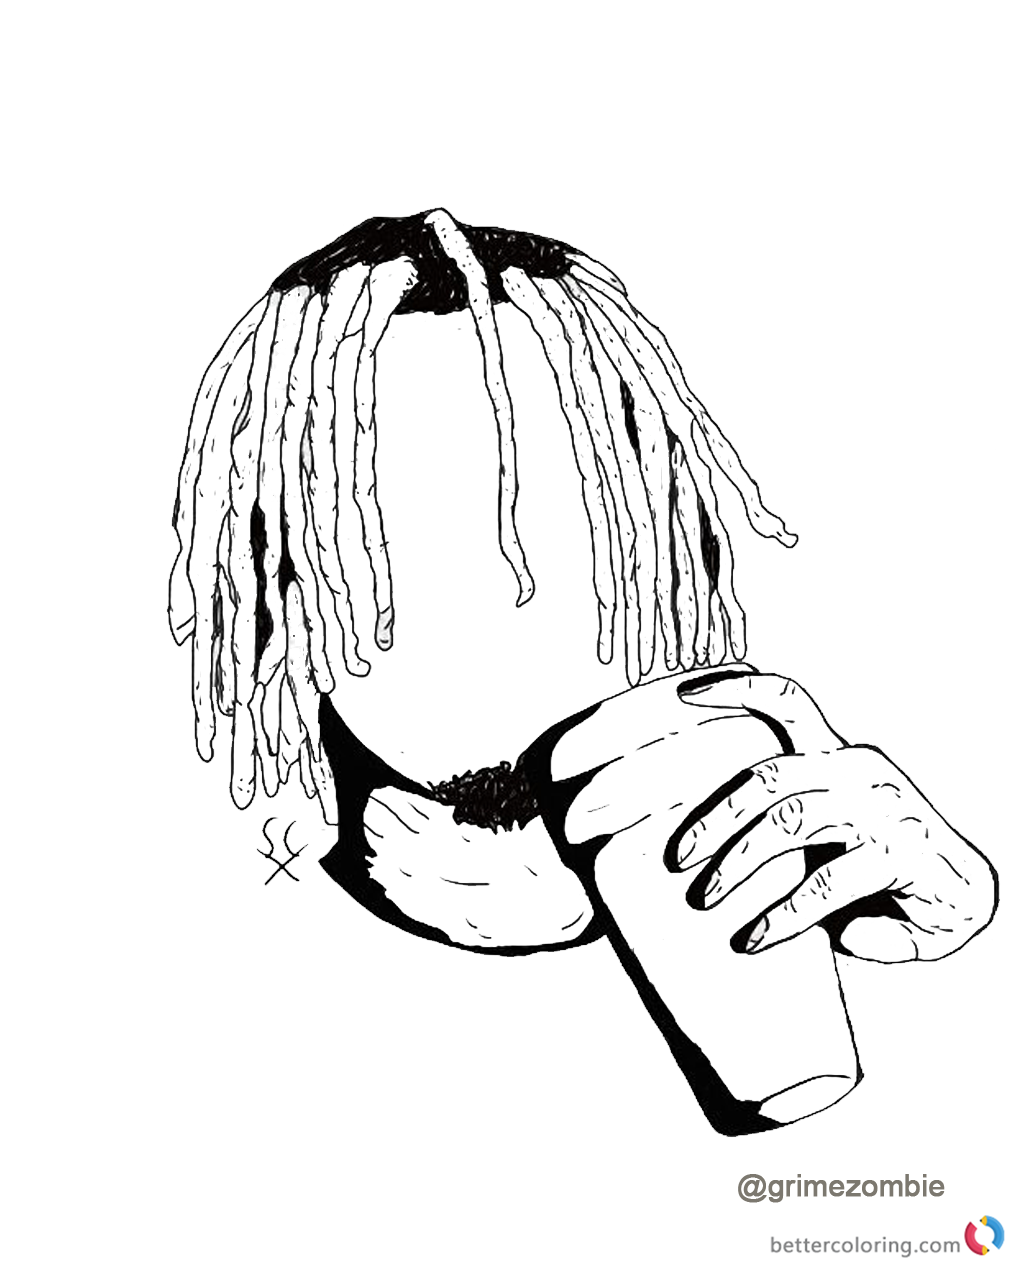 lil wayne coloring pages to print   Printable Lil Wayne Coloring Pages Me Sketch Coloring Page